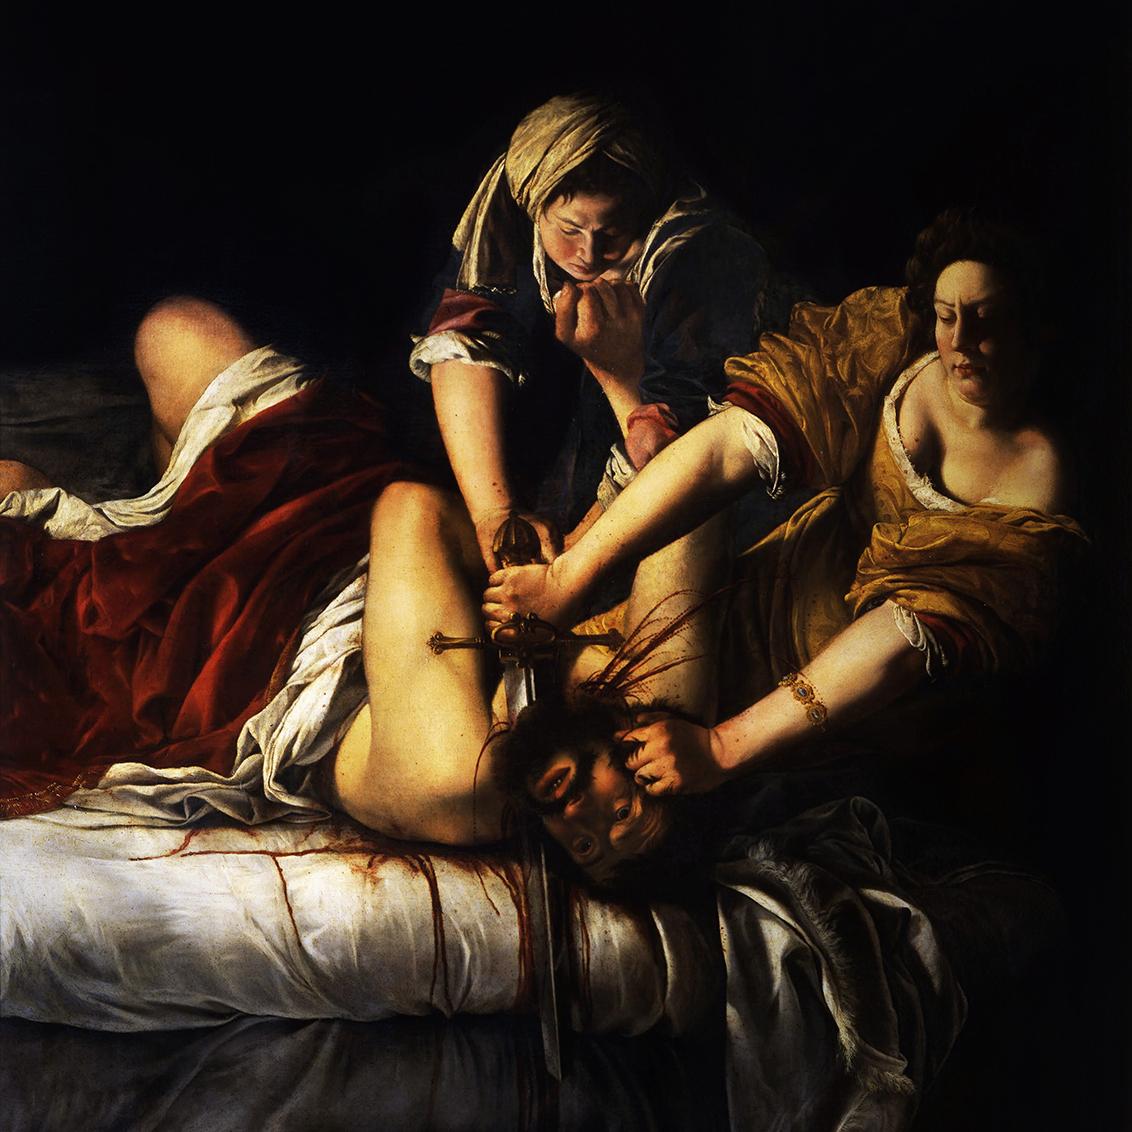 Artemisia Gentileschi, Judith Slaying Holofernes